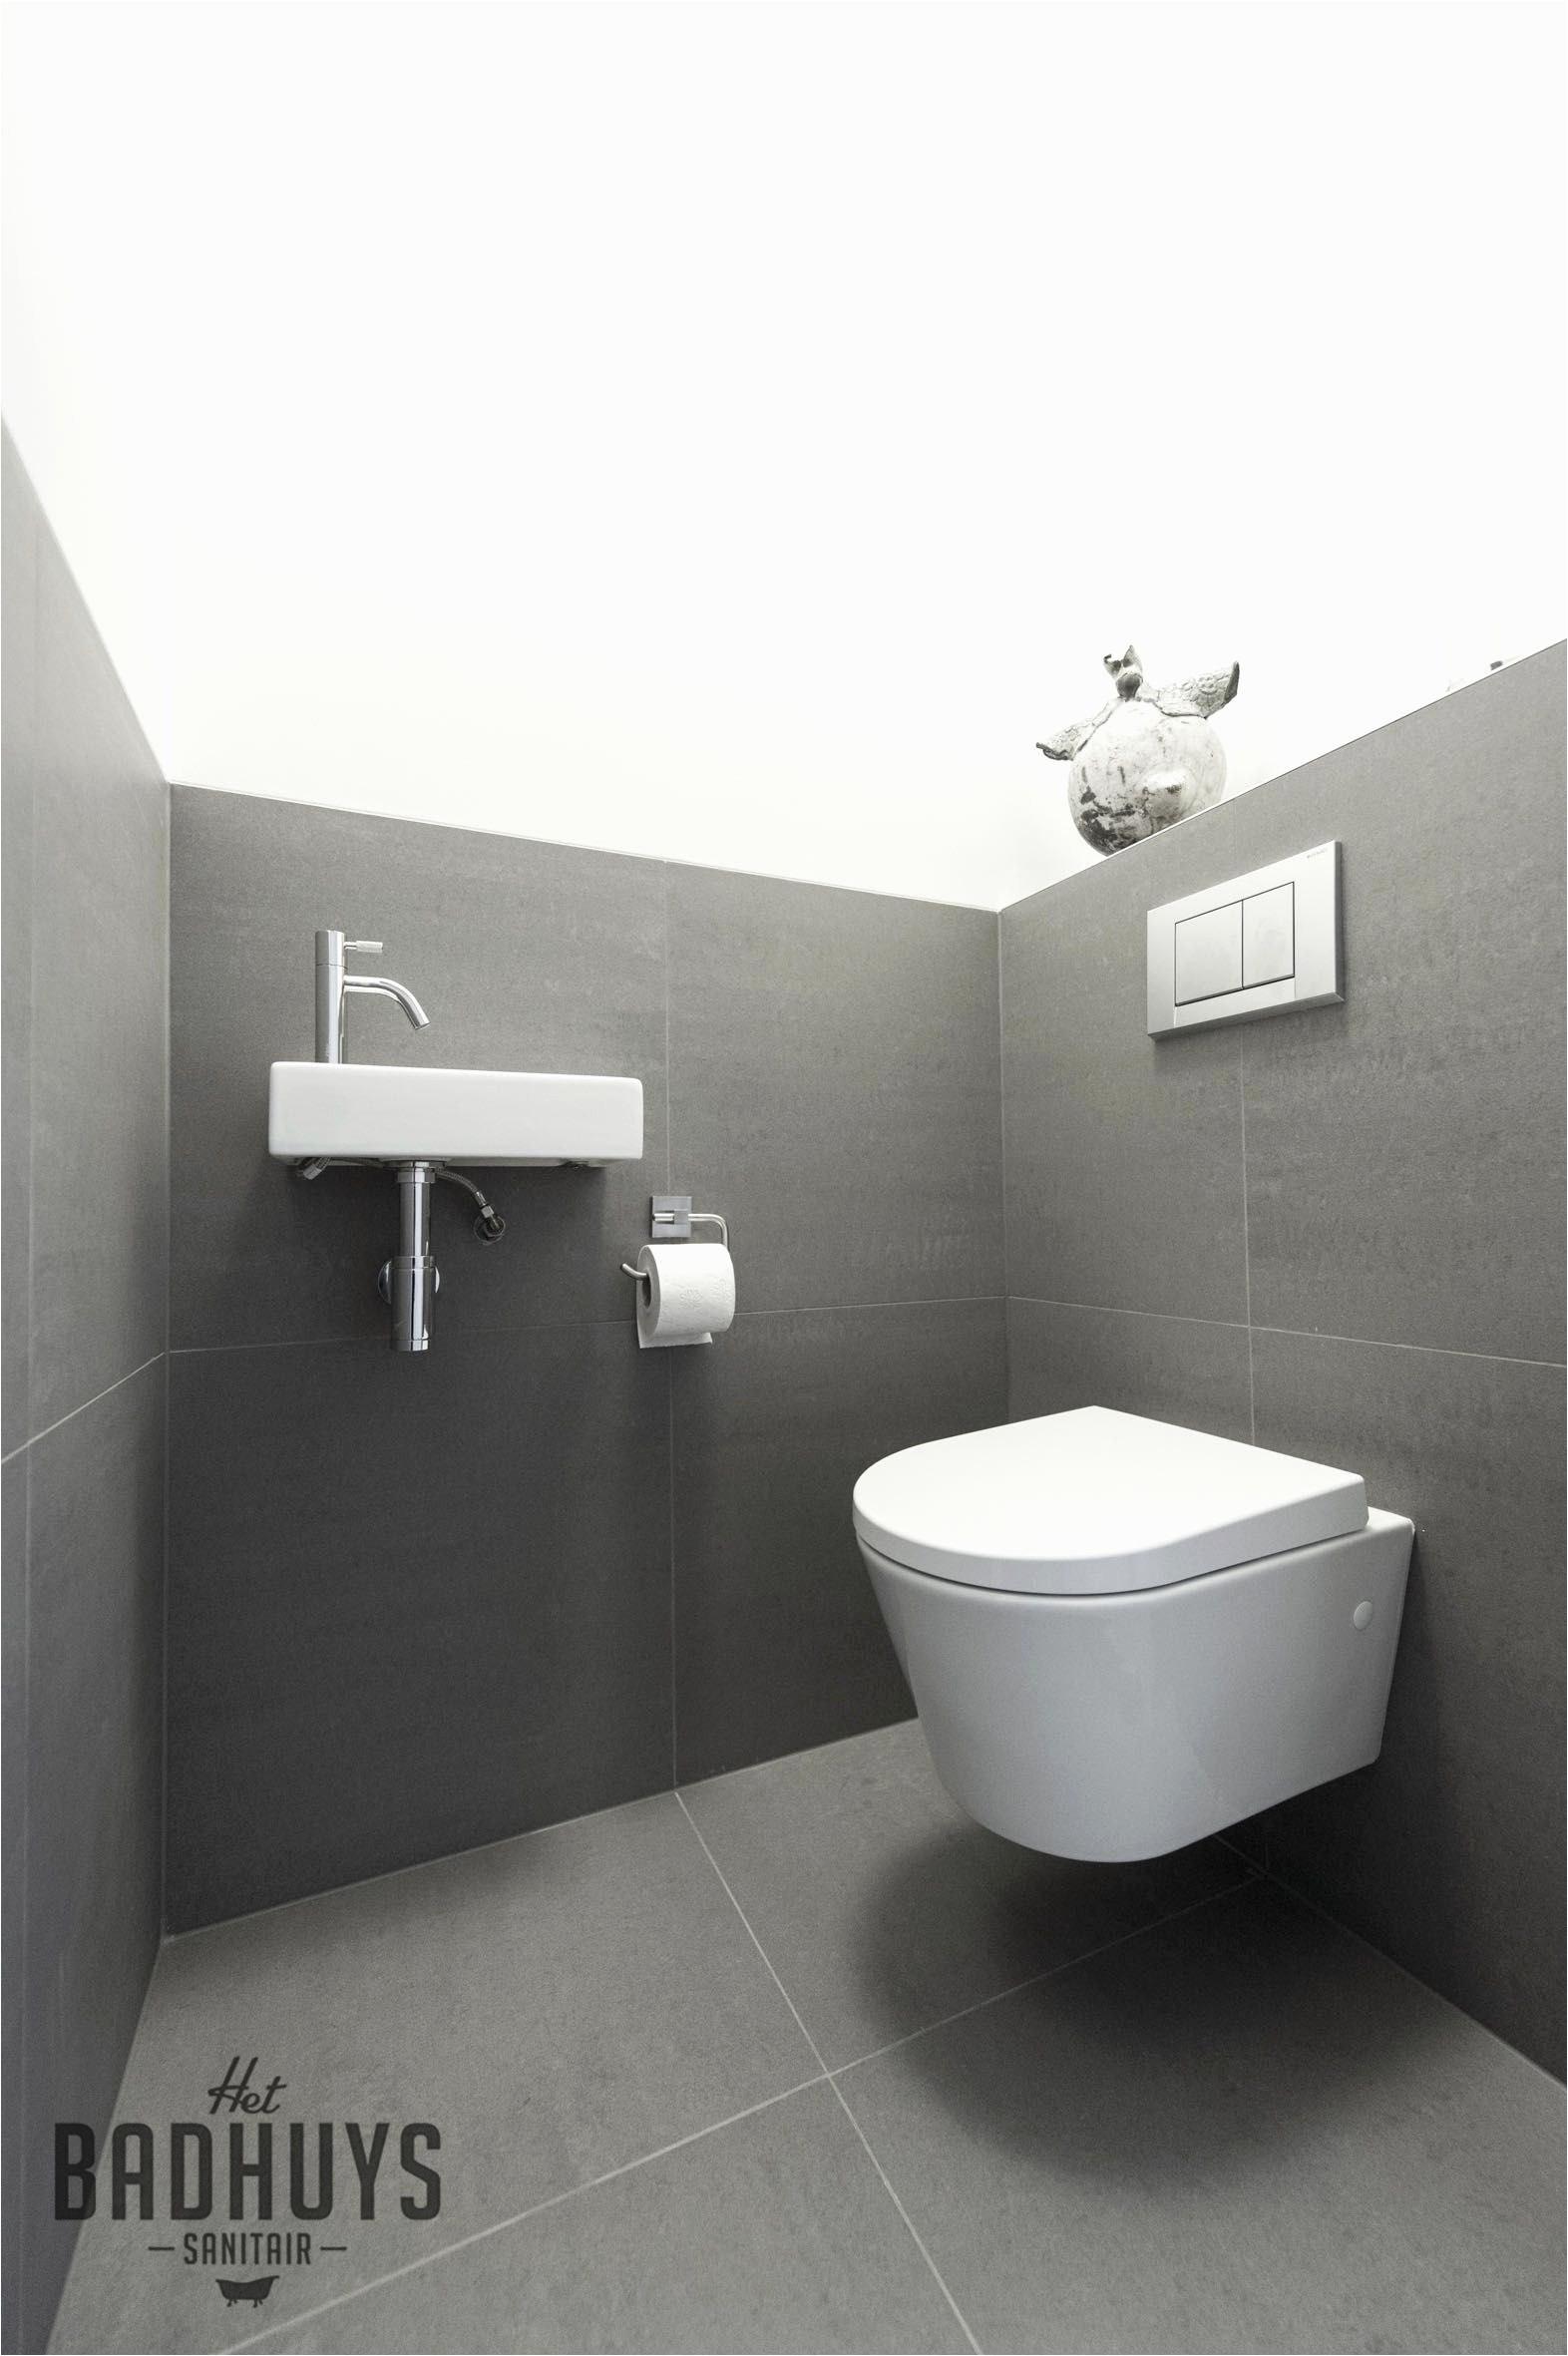 Bathroom Design Tips and Ideas Unique Inspiration Small Bathroom Design Tips